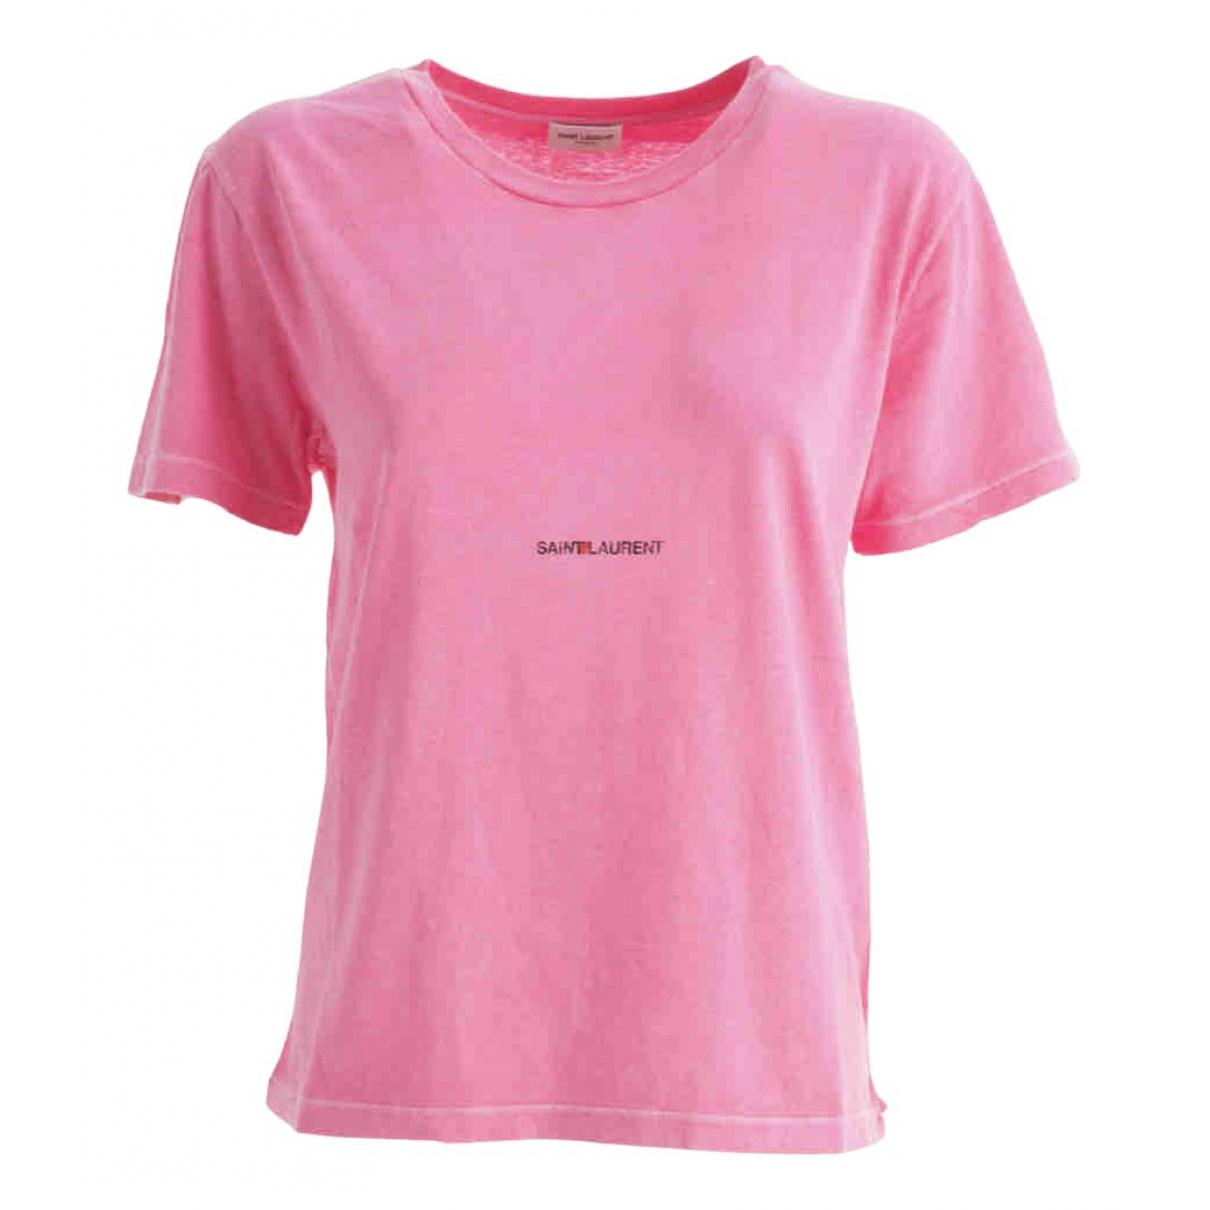 Saint Laurent \N Pink Cotton  top for Women M International